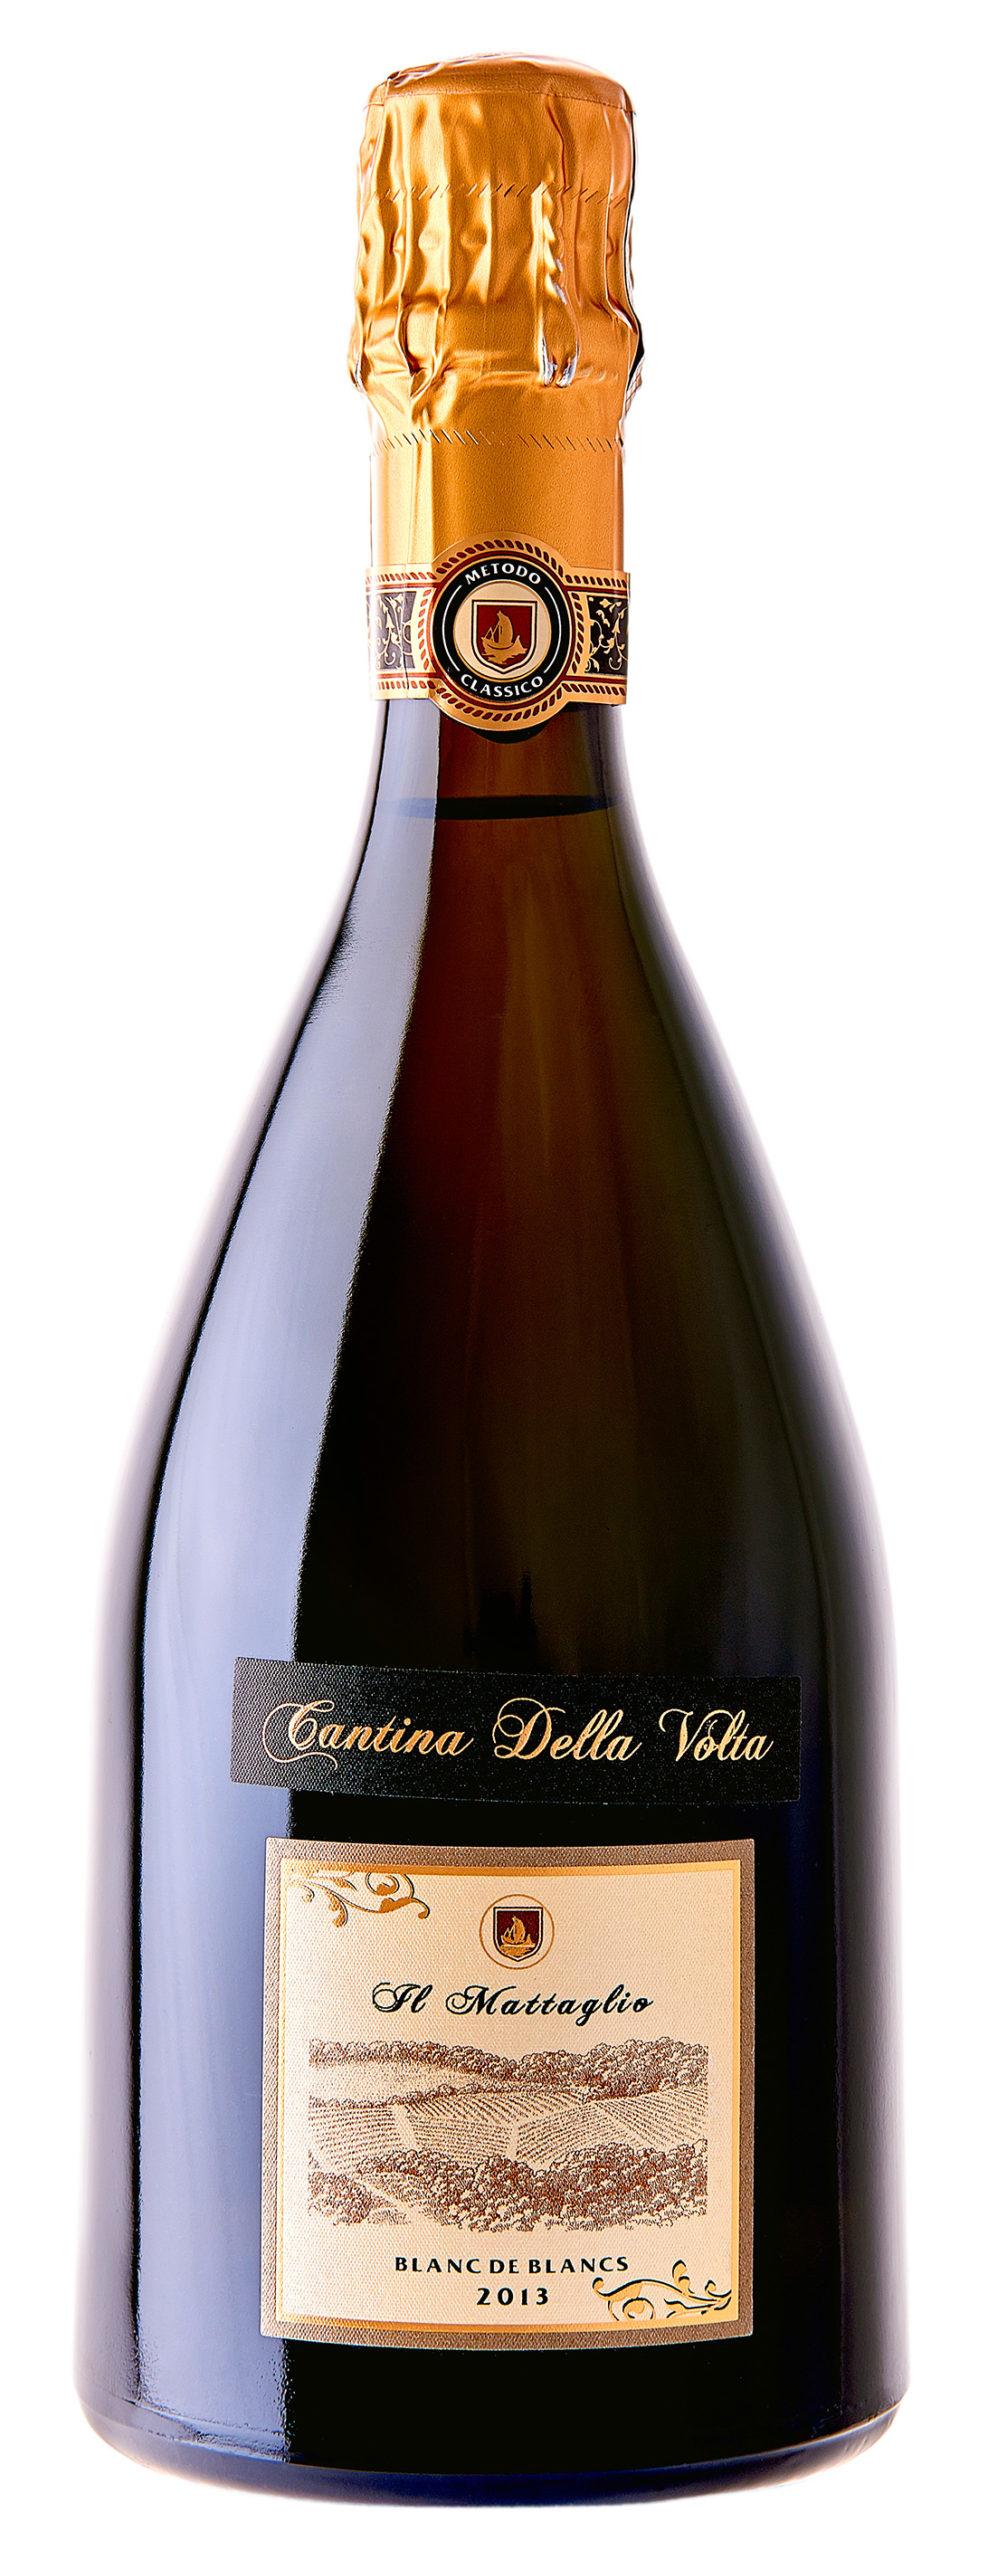 Vino spumante Spumante Brut Metodo Classico Mattaglio Blanc de Blancs